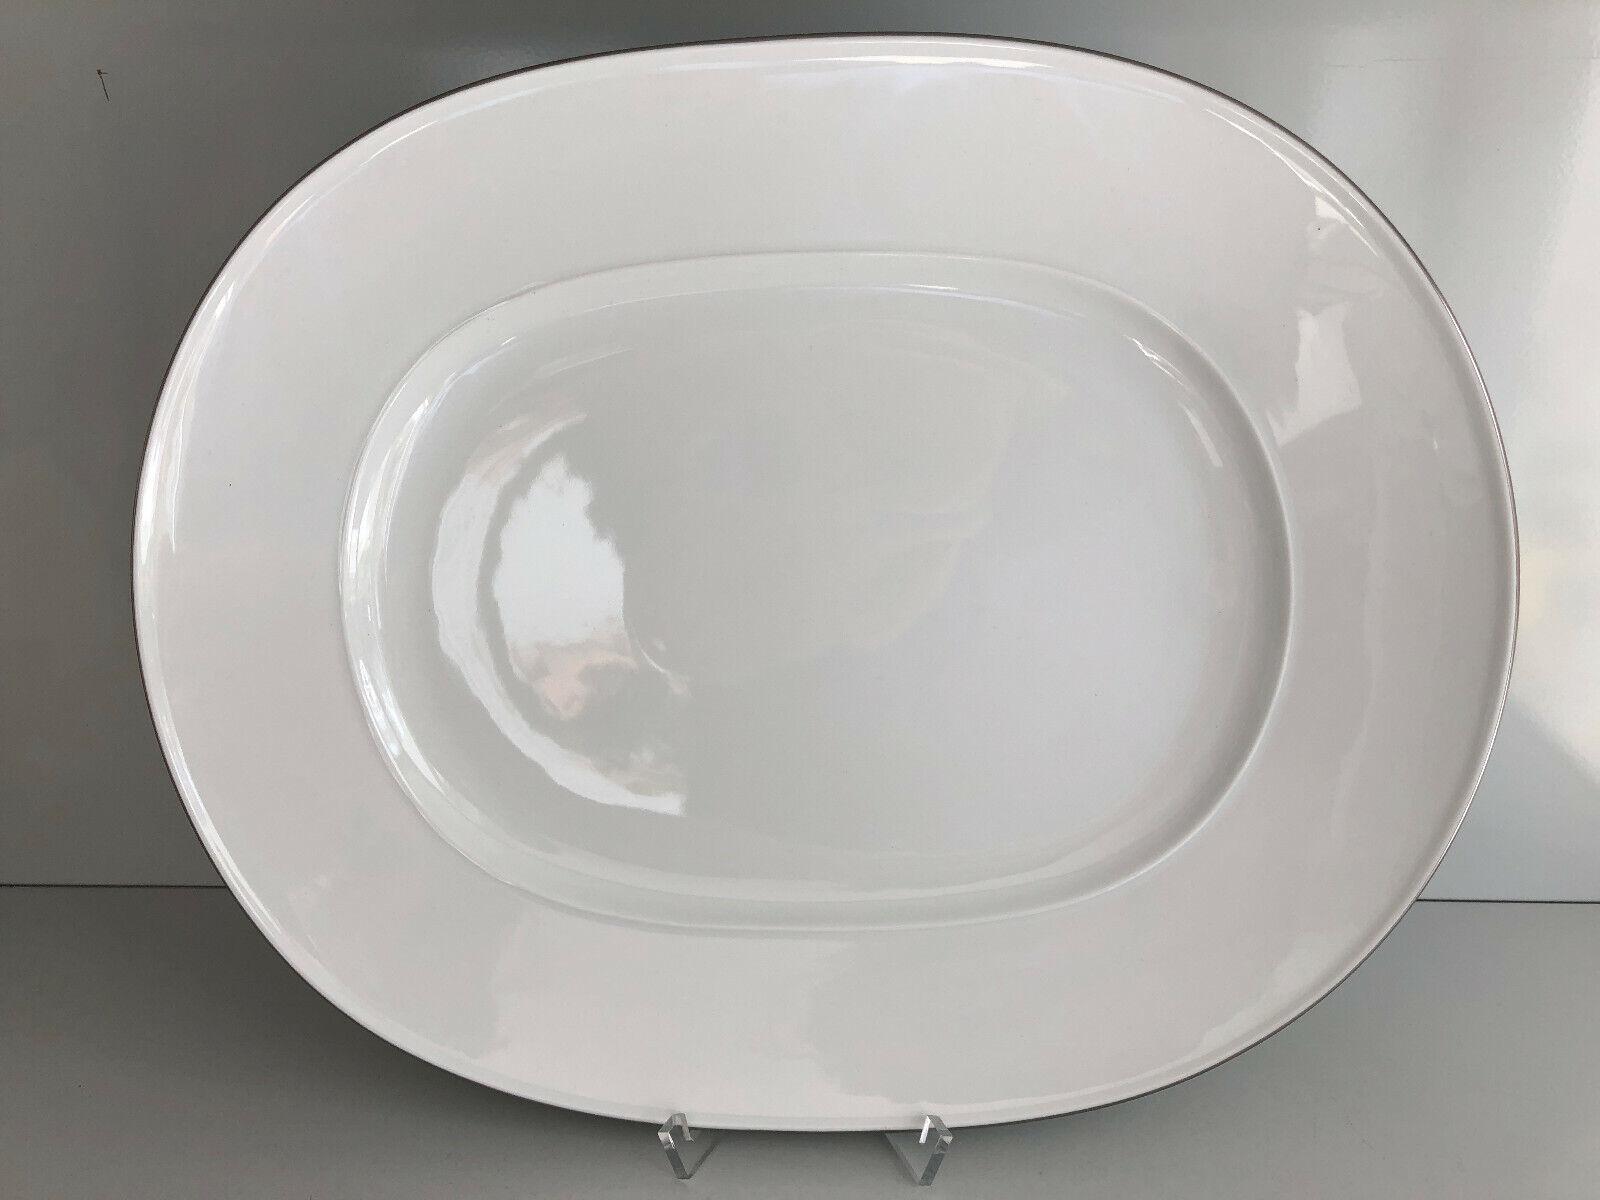 KPM Berlin URANIA Dekor 11 Platin PLATTE oval groß 30,5 x 37cm Unbenutzt Platter